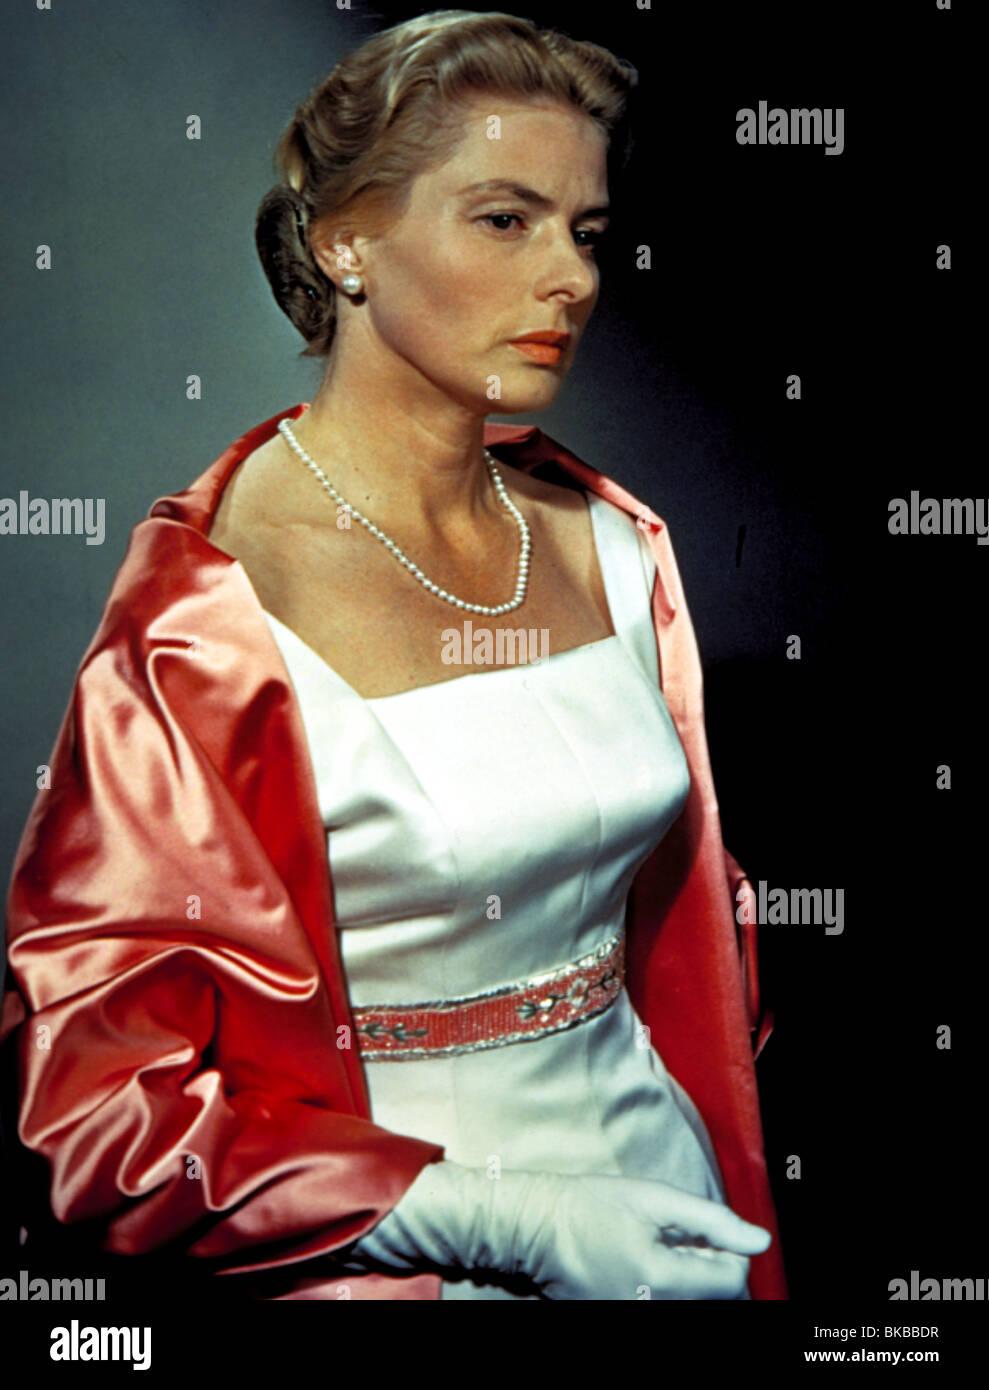 INDISCREET (1958) INGRID BERGMAN IDST 001OS - Stock Image